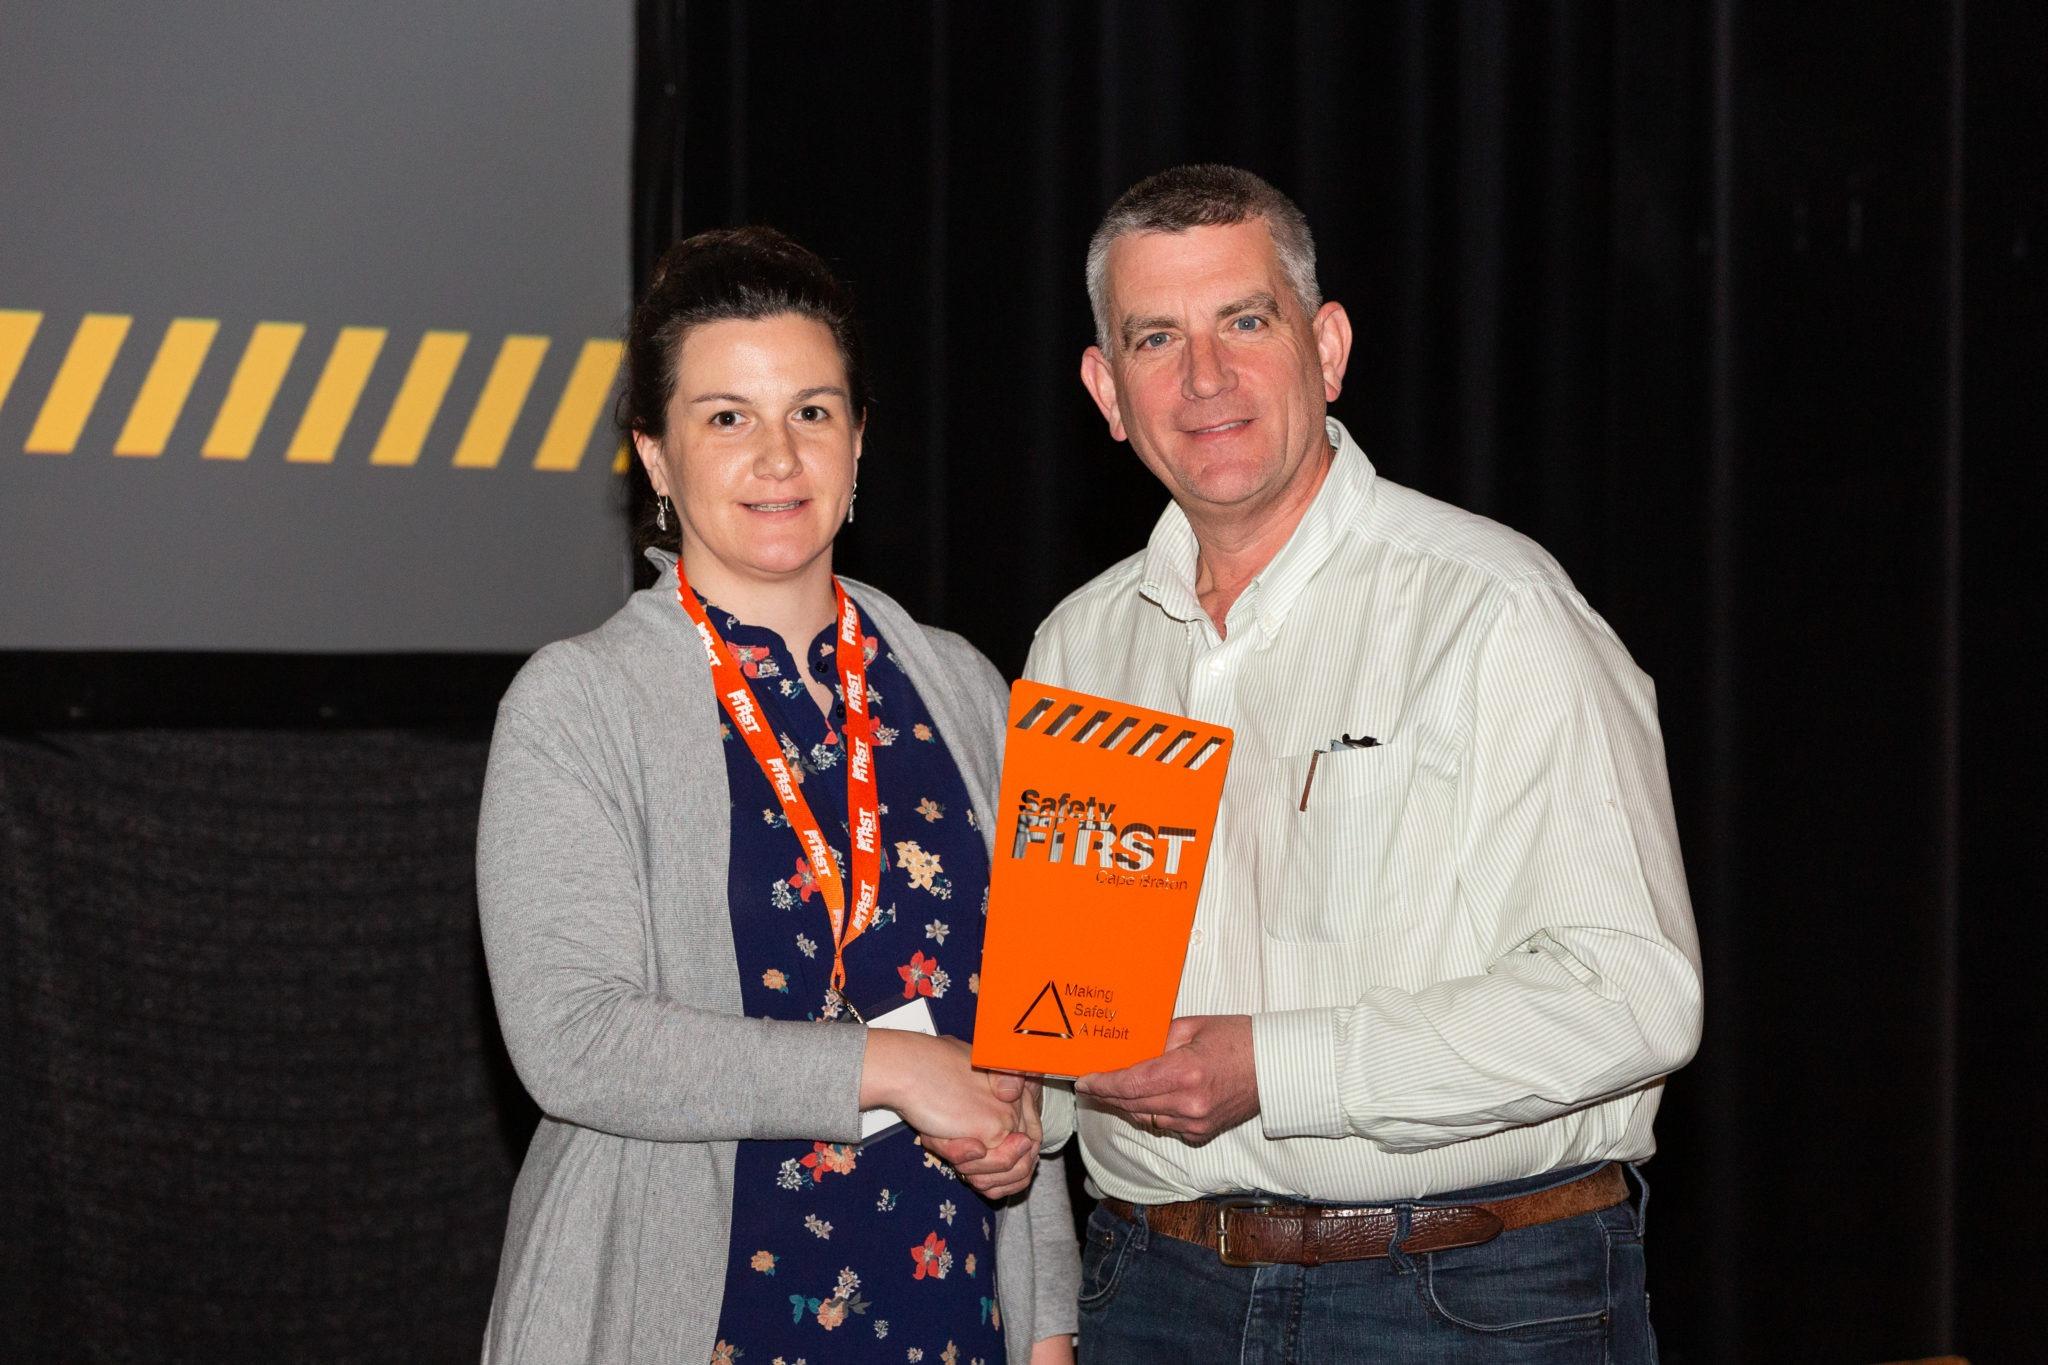 Safety First In Cape Breton Symposium 2019